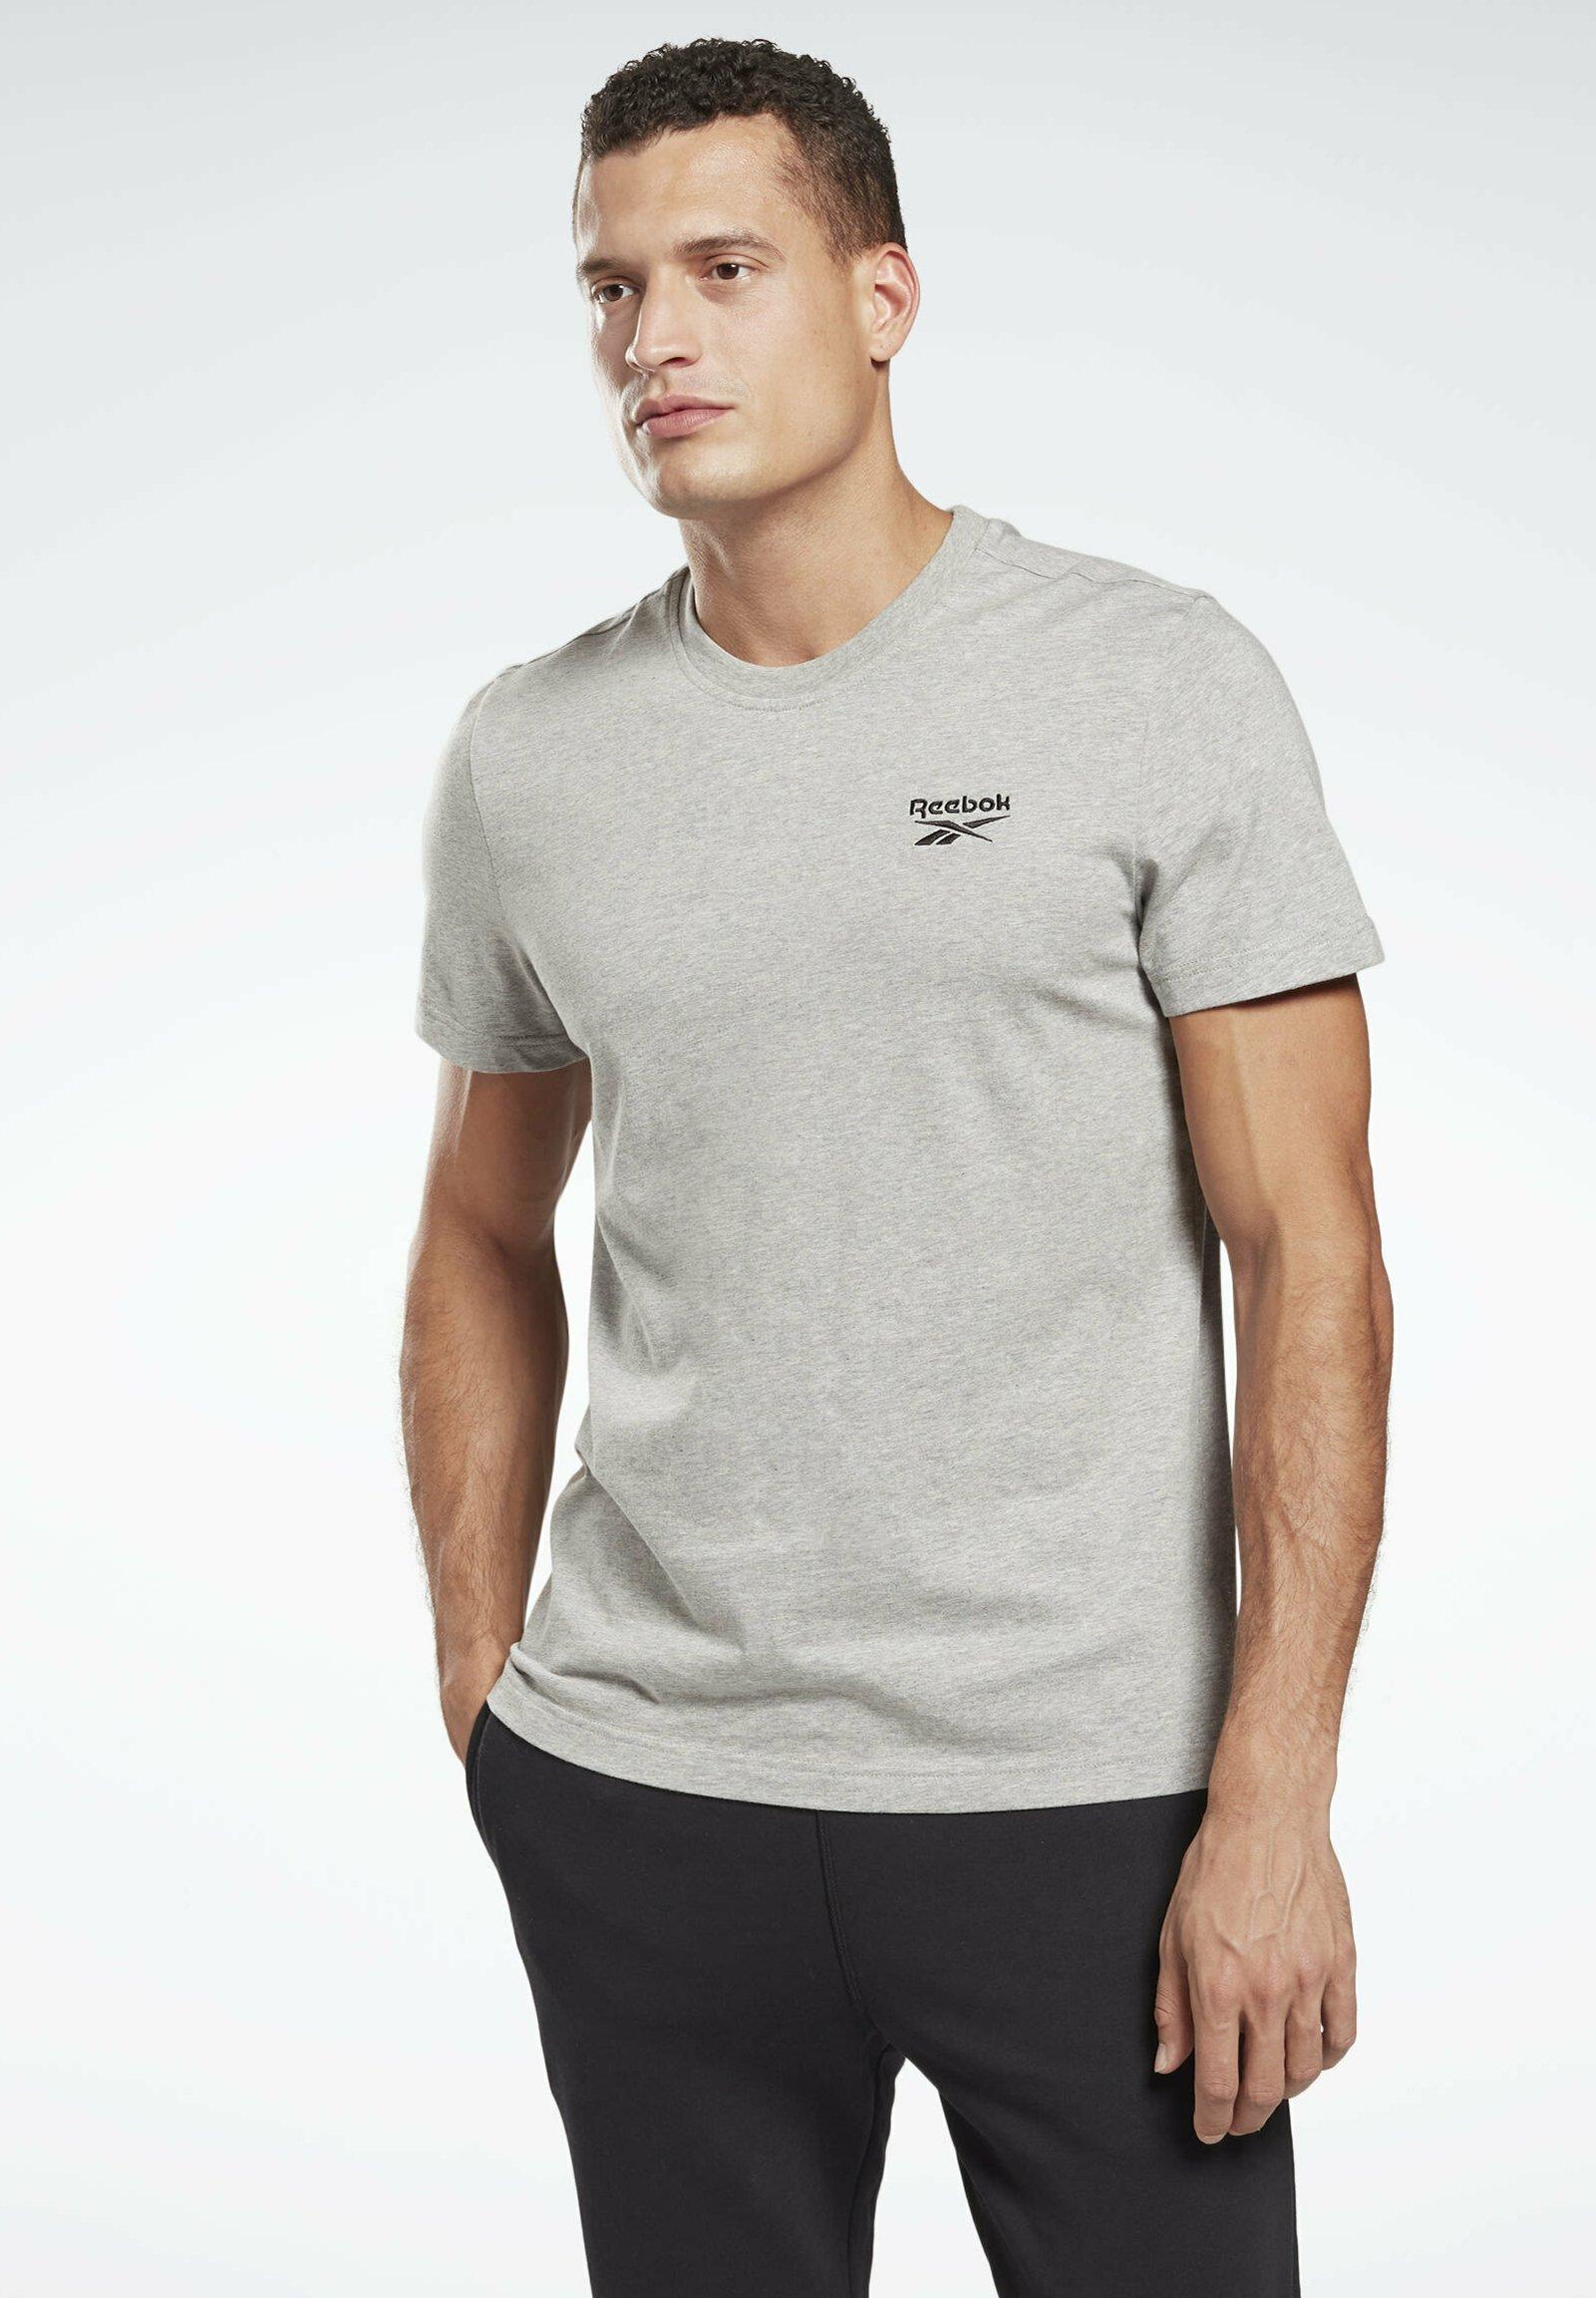 Homme REEBOK IDENTITY T-SHIRT - T-shirt basique